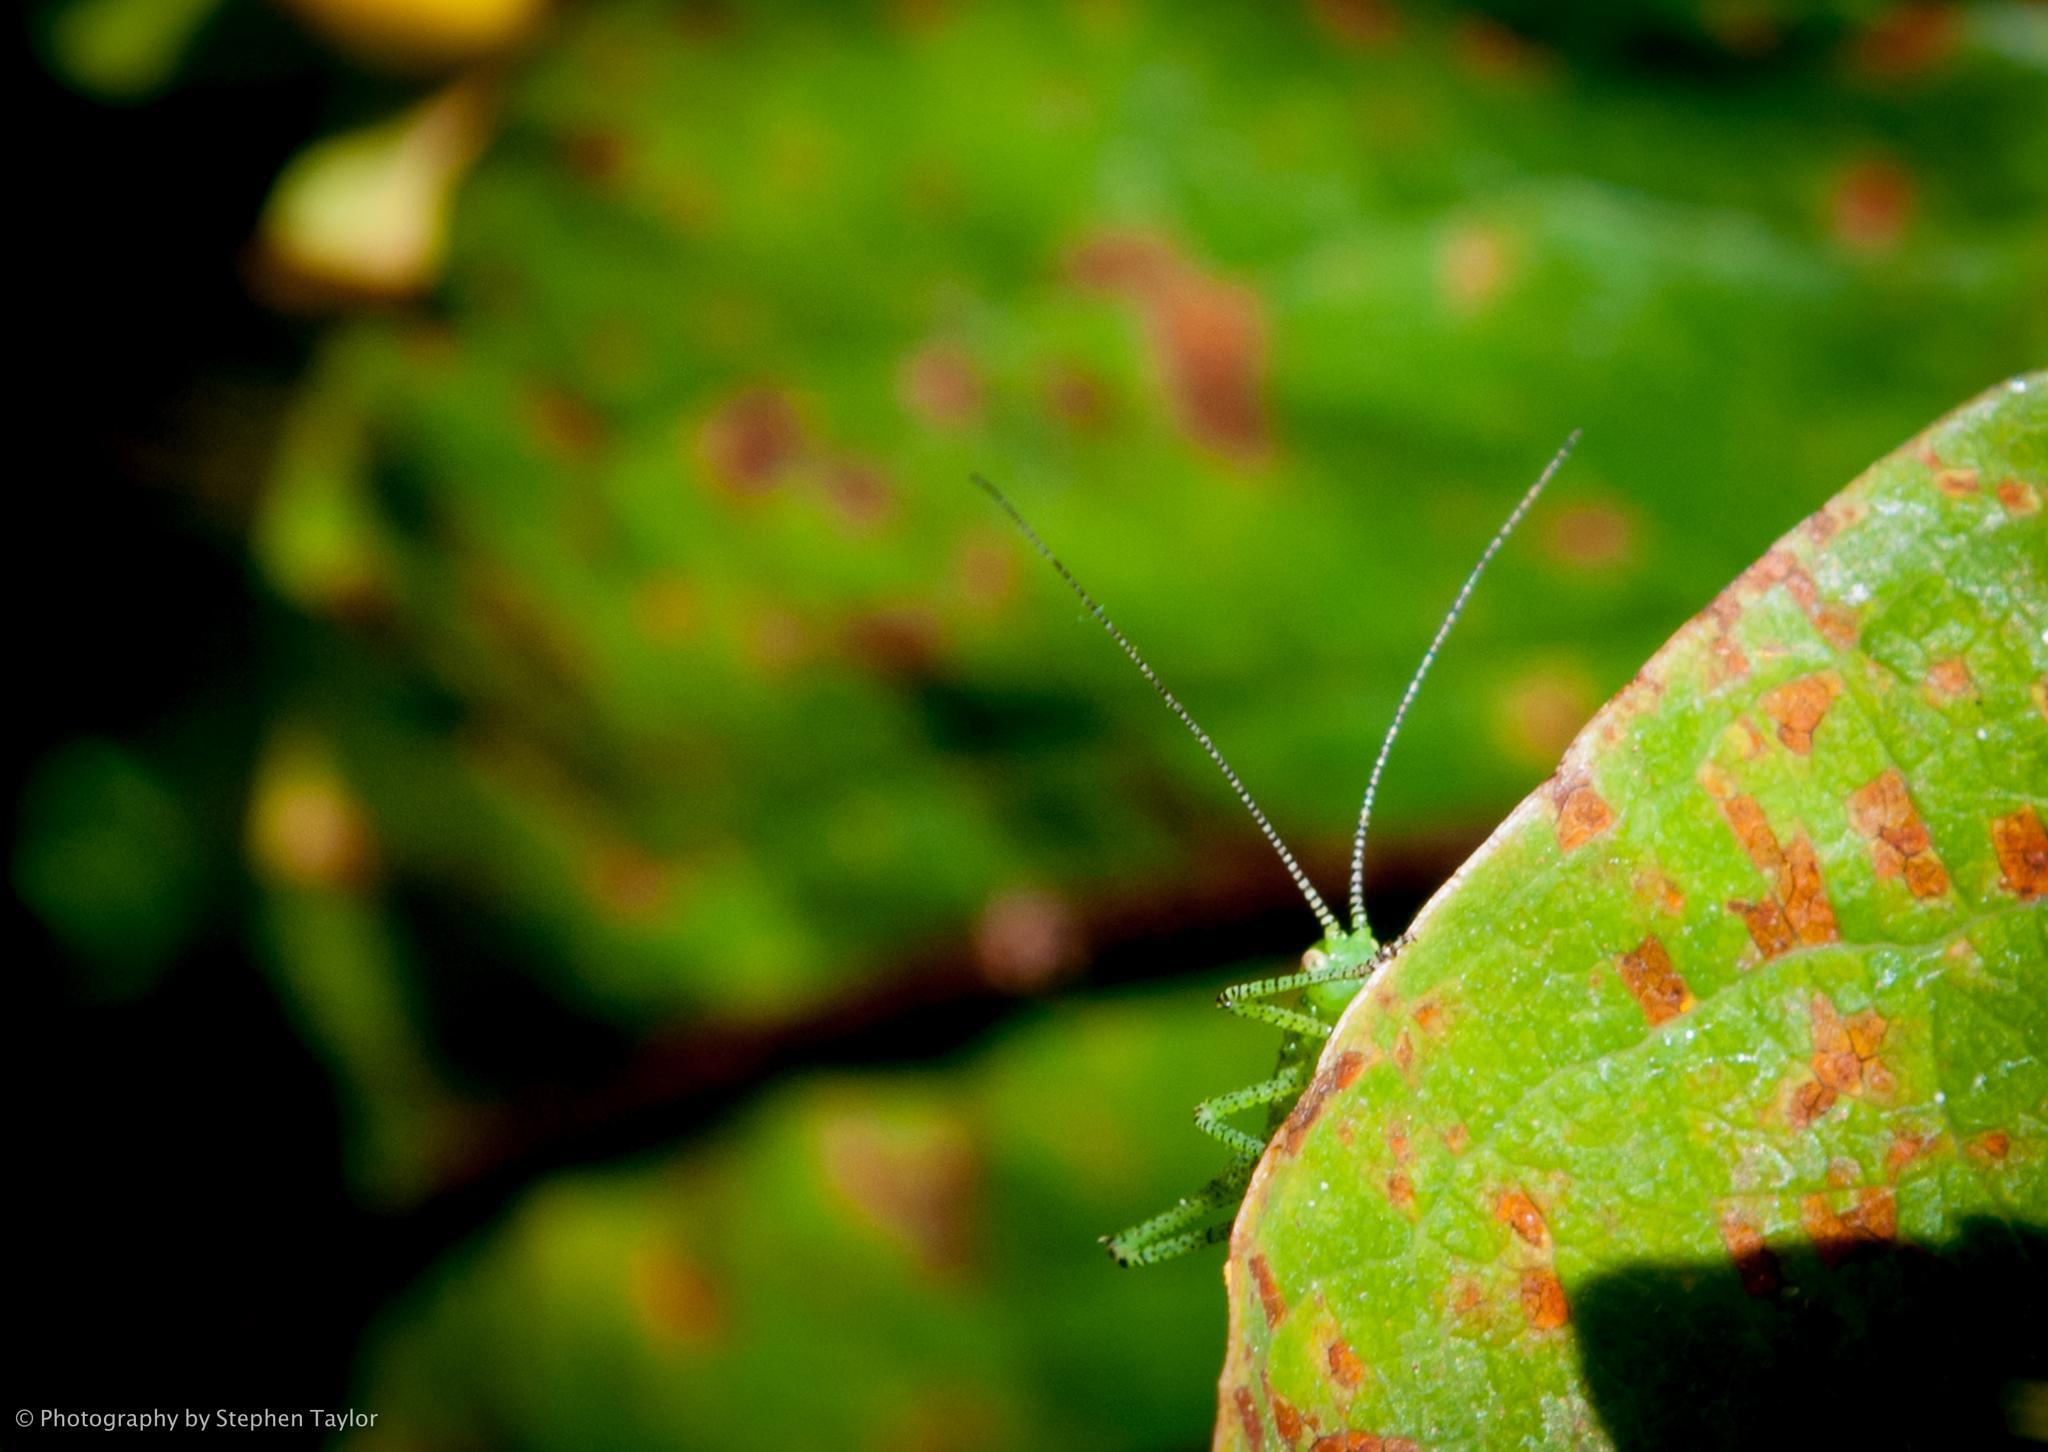 Grasshopper on a leaf by Stephen Taylor